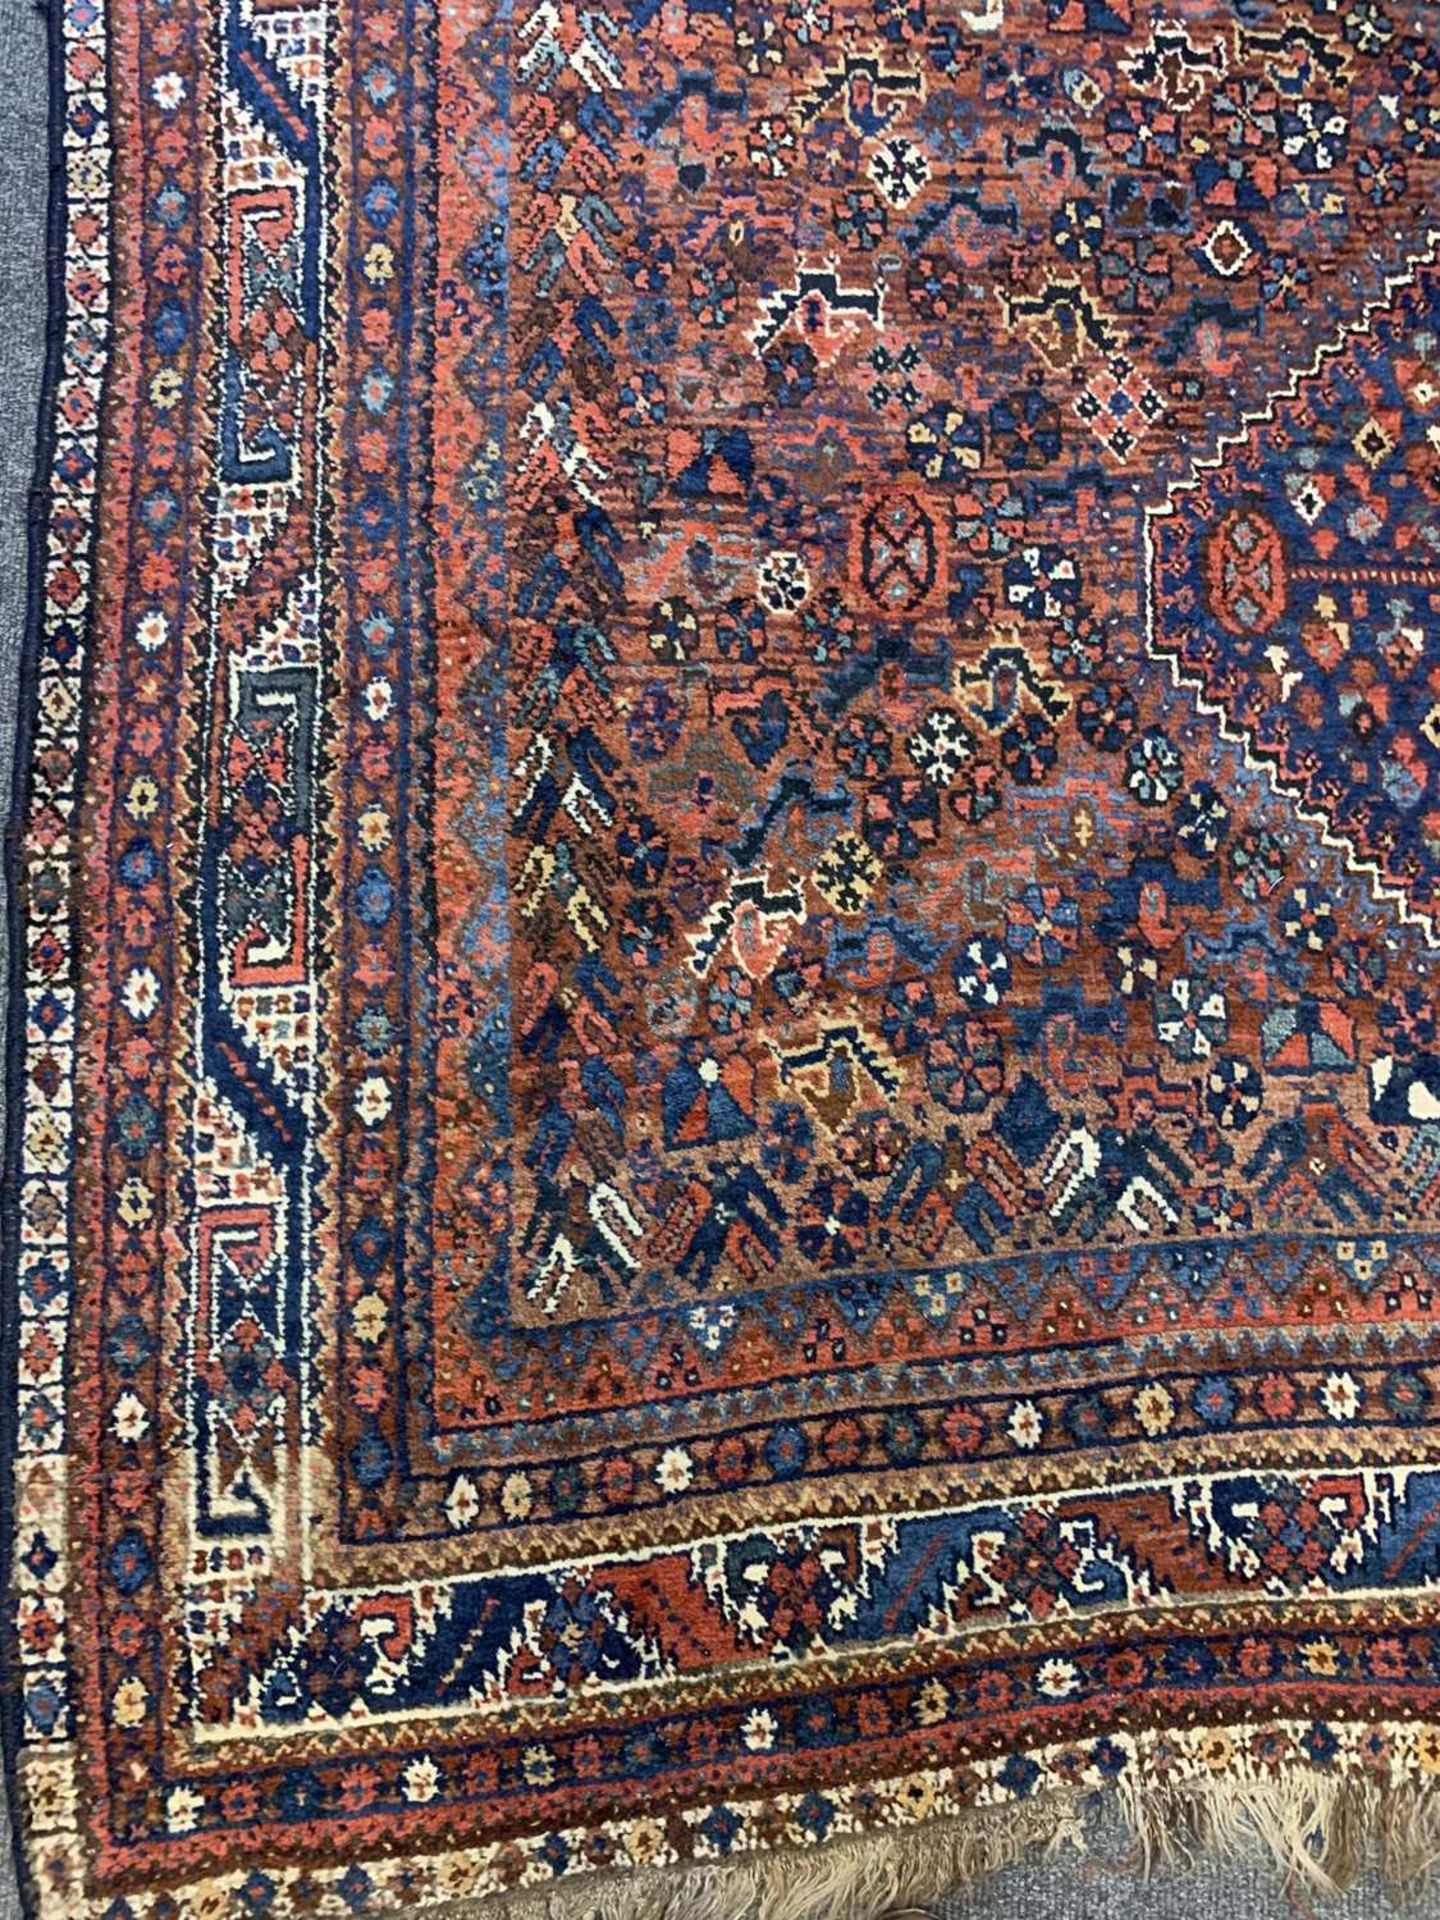 A South West Persian Khamseh carpet, - Image 11 of 17